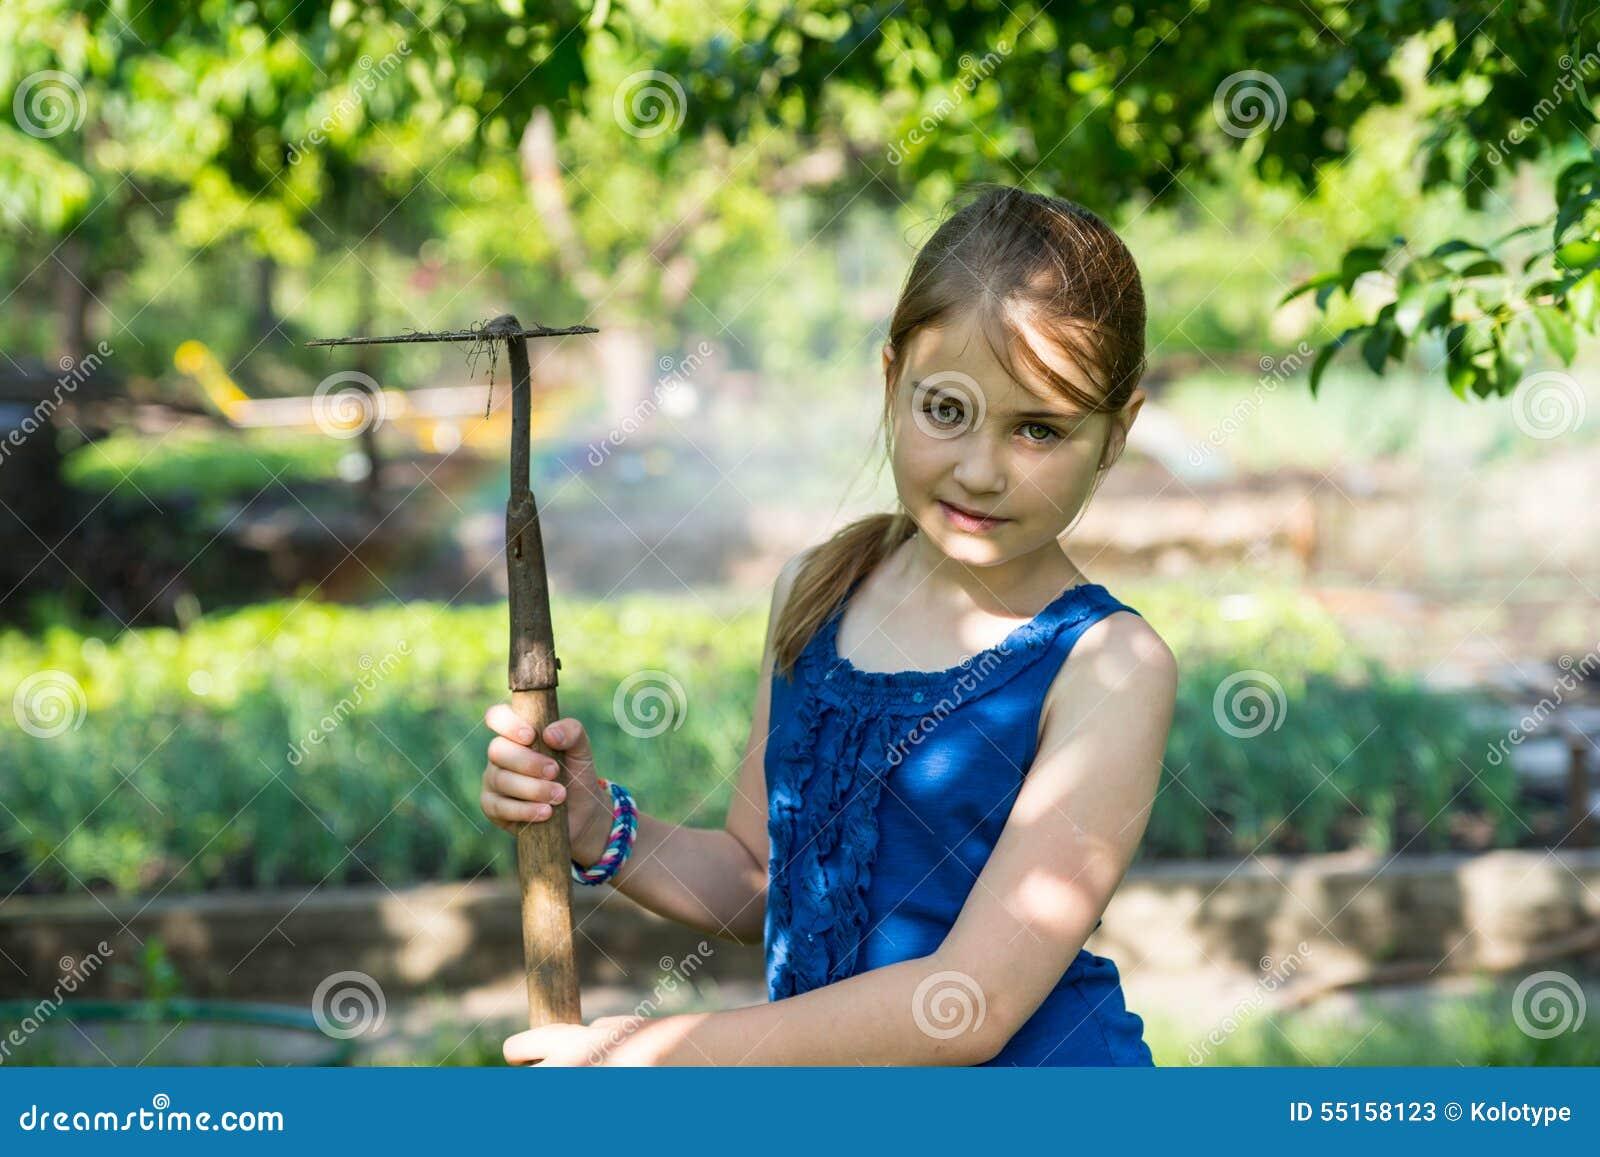 Ххх рус девушки на огороде фото улице для